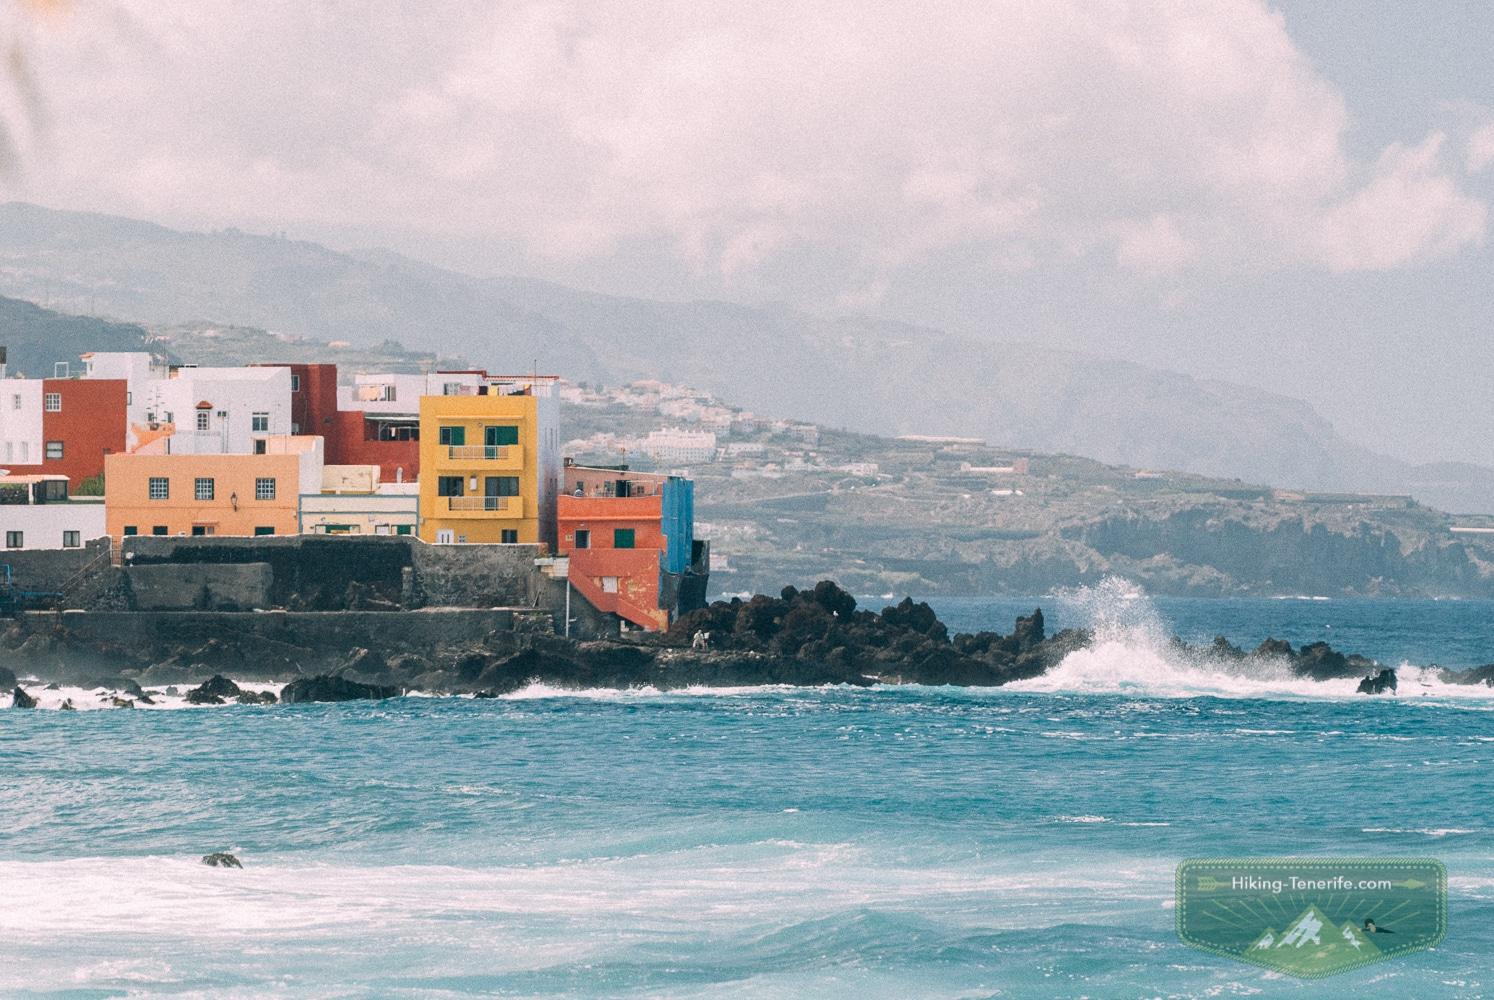 плая хардин в пуэрто де ла круз